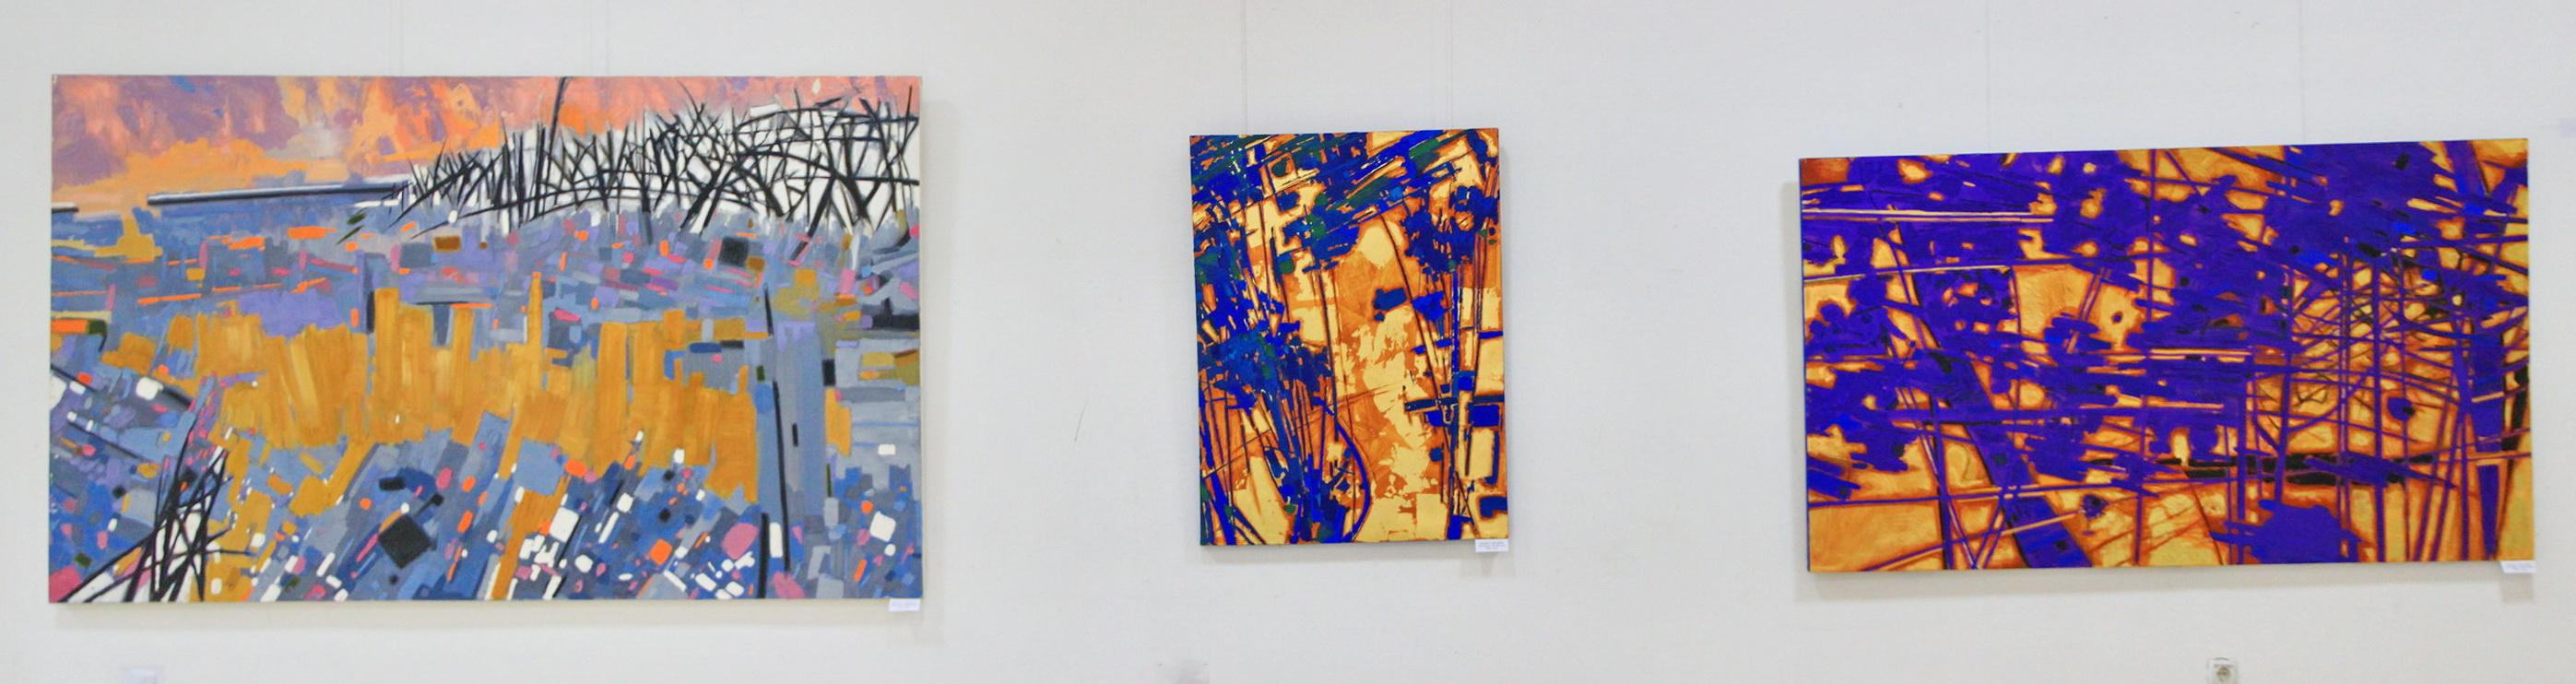 Рахметов Тимур. Экспозиция работ.